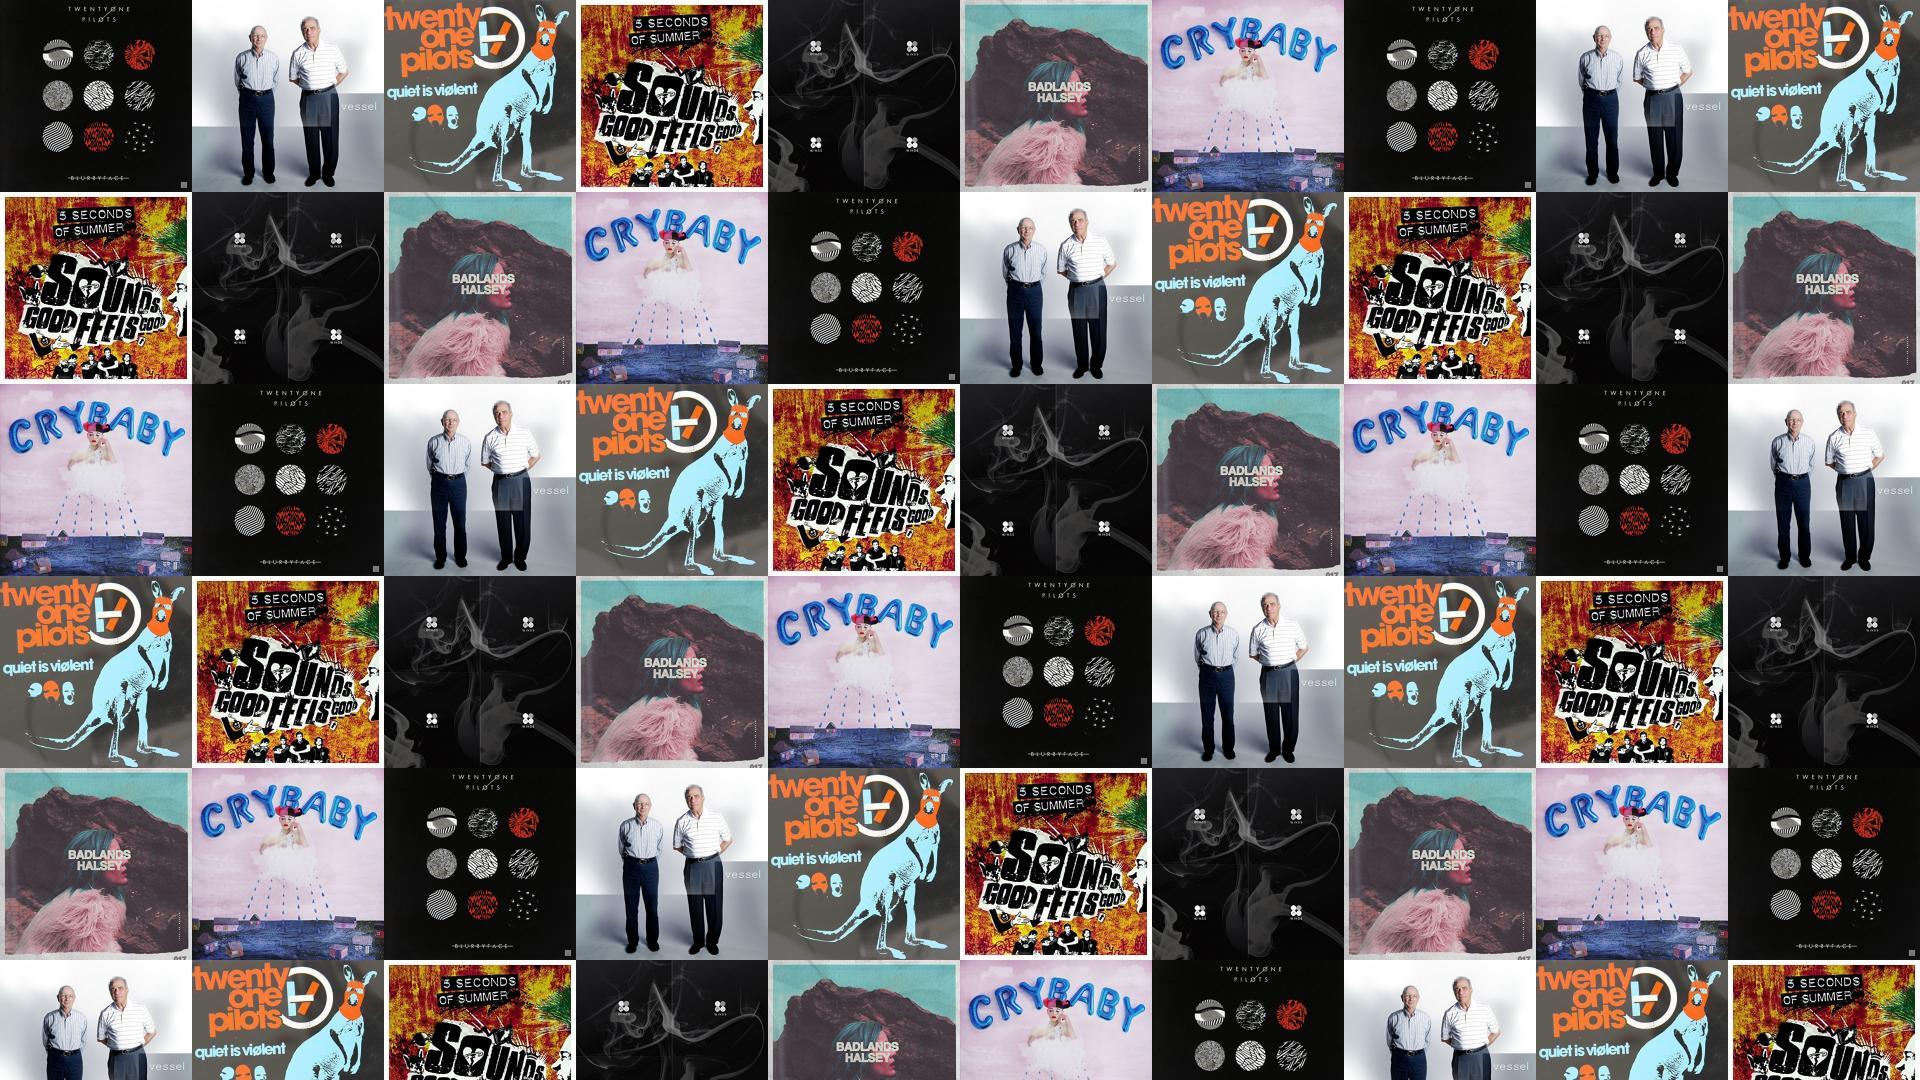 Twenty One Pilots Blurryface Vessel Quiet Violent Ep Wallpaper